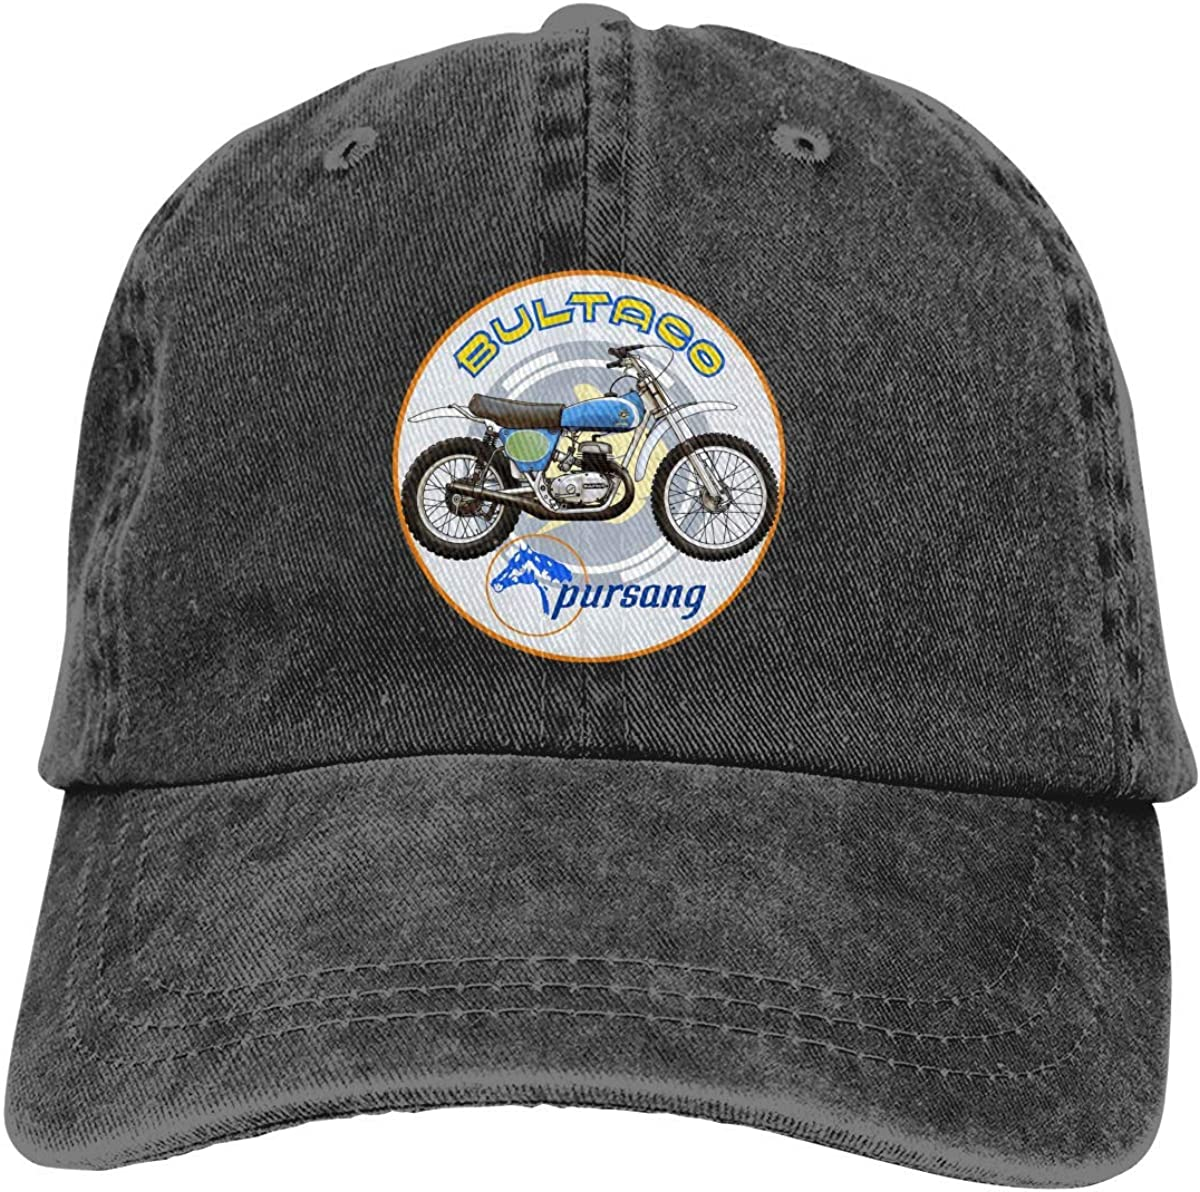 HFMVU Casqueta Unisex Plincally Bultaco Pursang Classic Casquette Baseball-Caps Black Cotton Adjustable Unisex Sombrero Gift